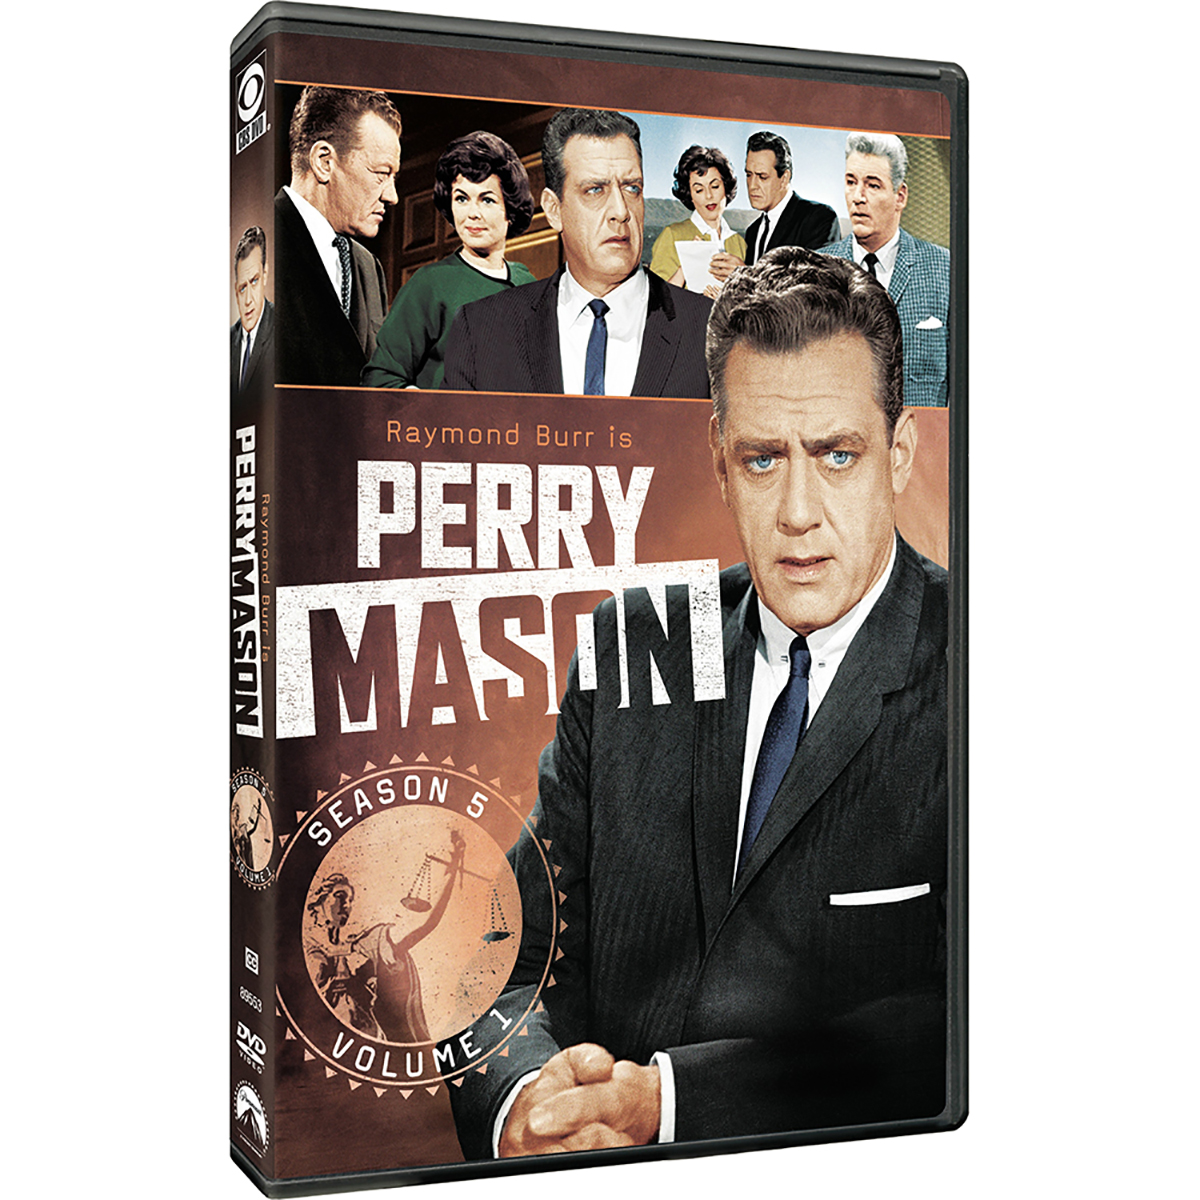 Perry Mason: Season 5 - Volume 1 DVD